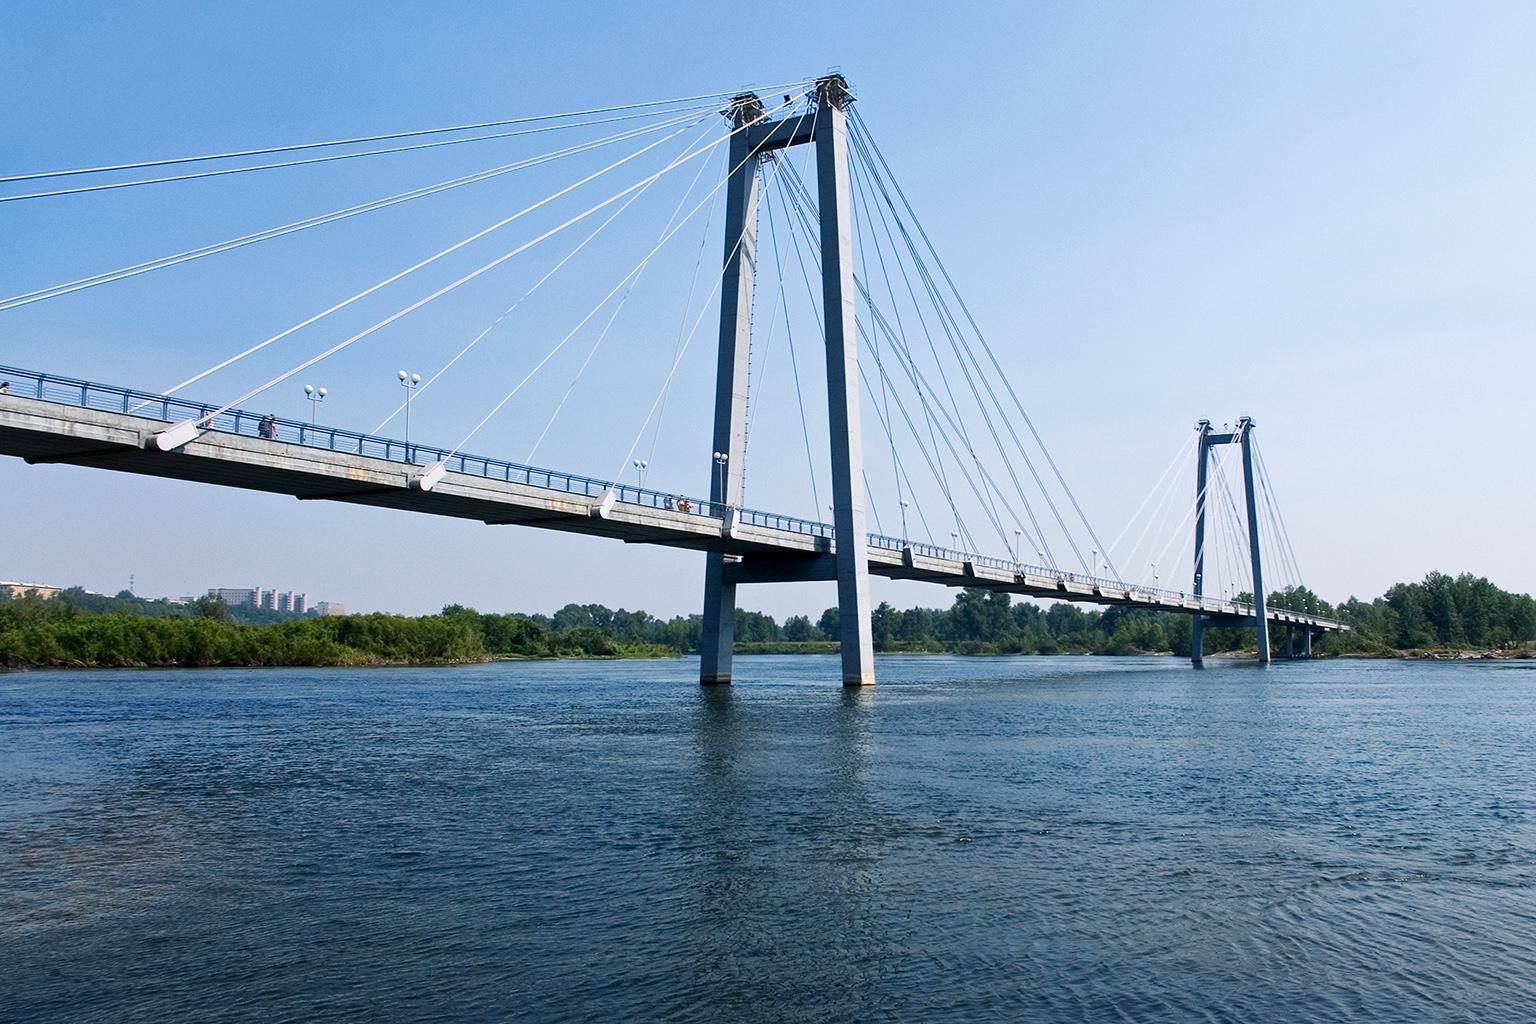 File:vantovyjj most, the bridge in krasnoyarsk, russia, view from the